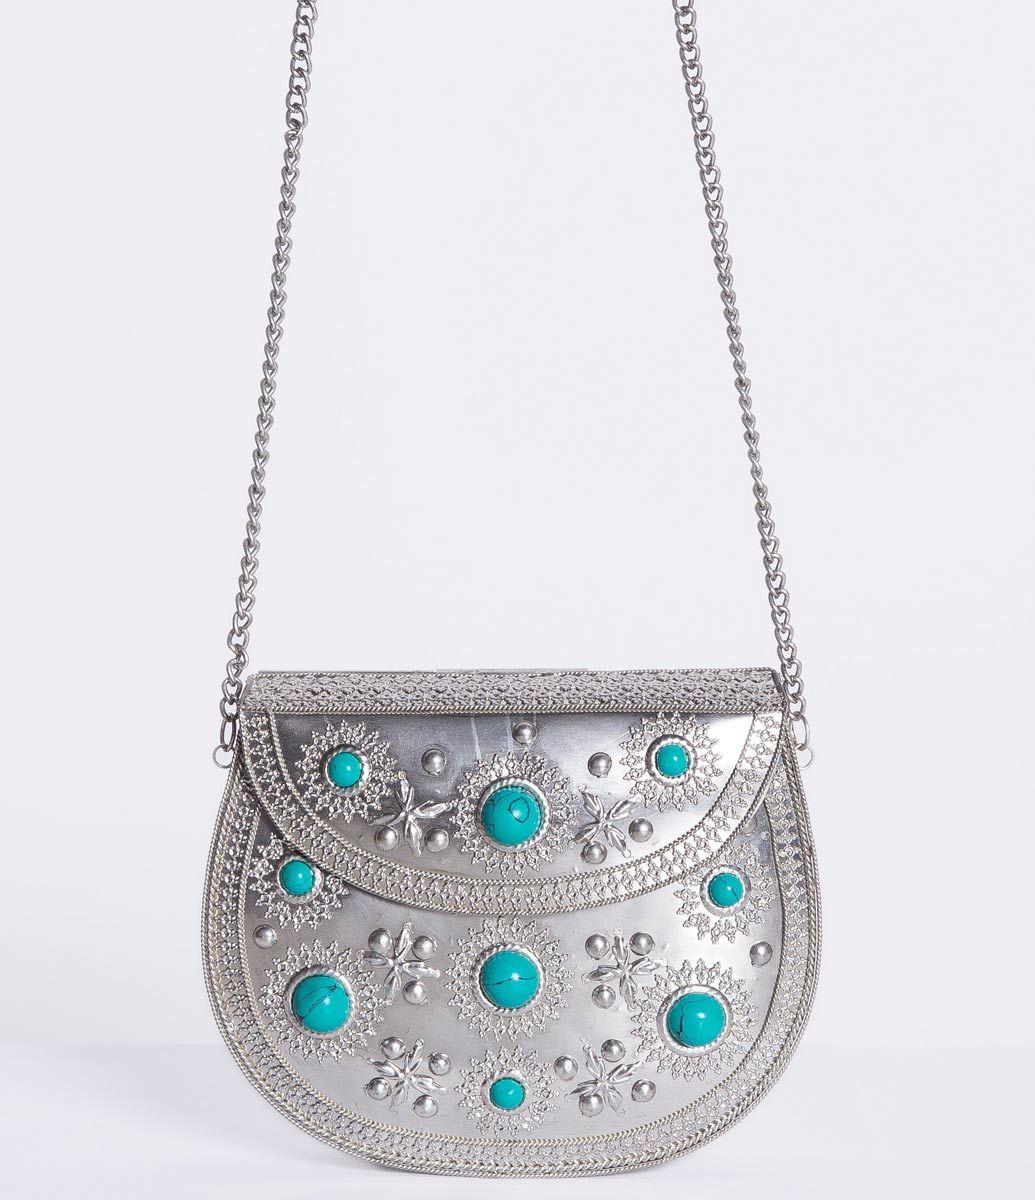 Bolsa Feminina Metalizada com Pedraria - Lojas Renner - R$90